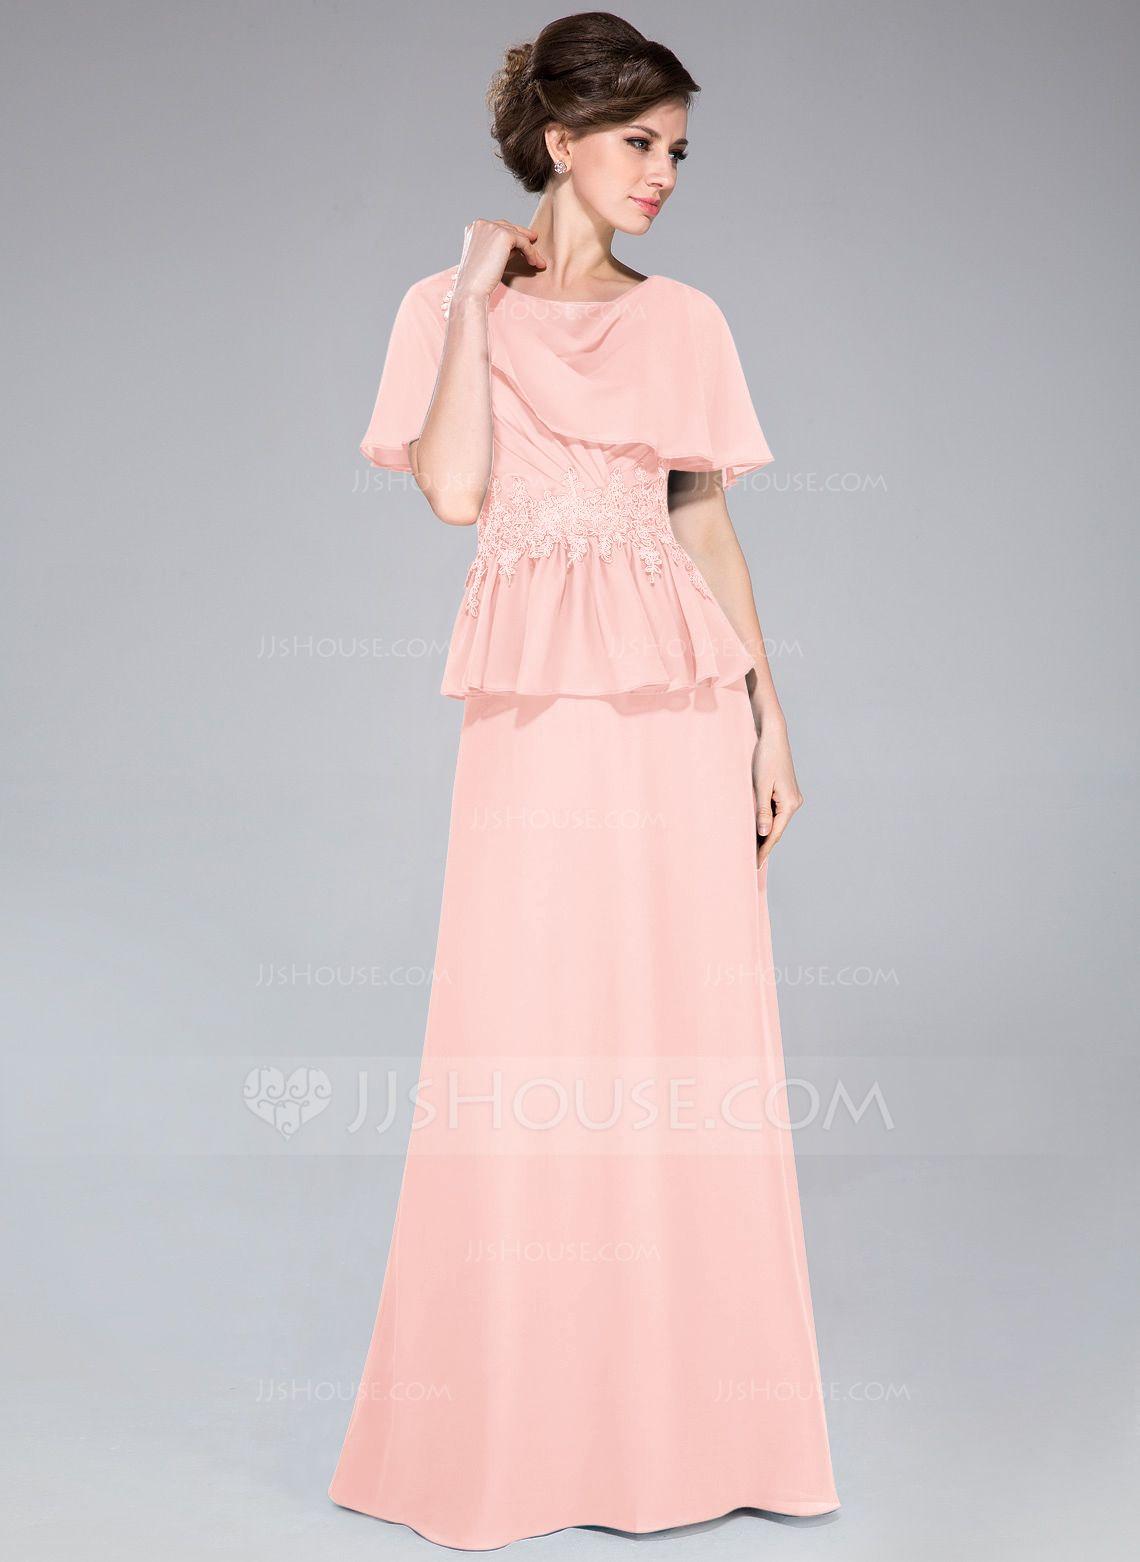 Bonito Madre De La Longitud Del Té Vestidos De Novia Ideas Ornamento ...